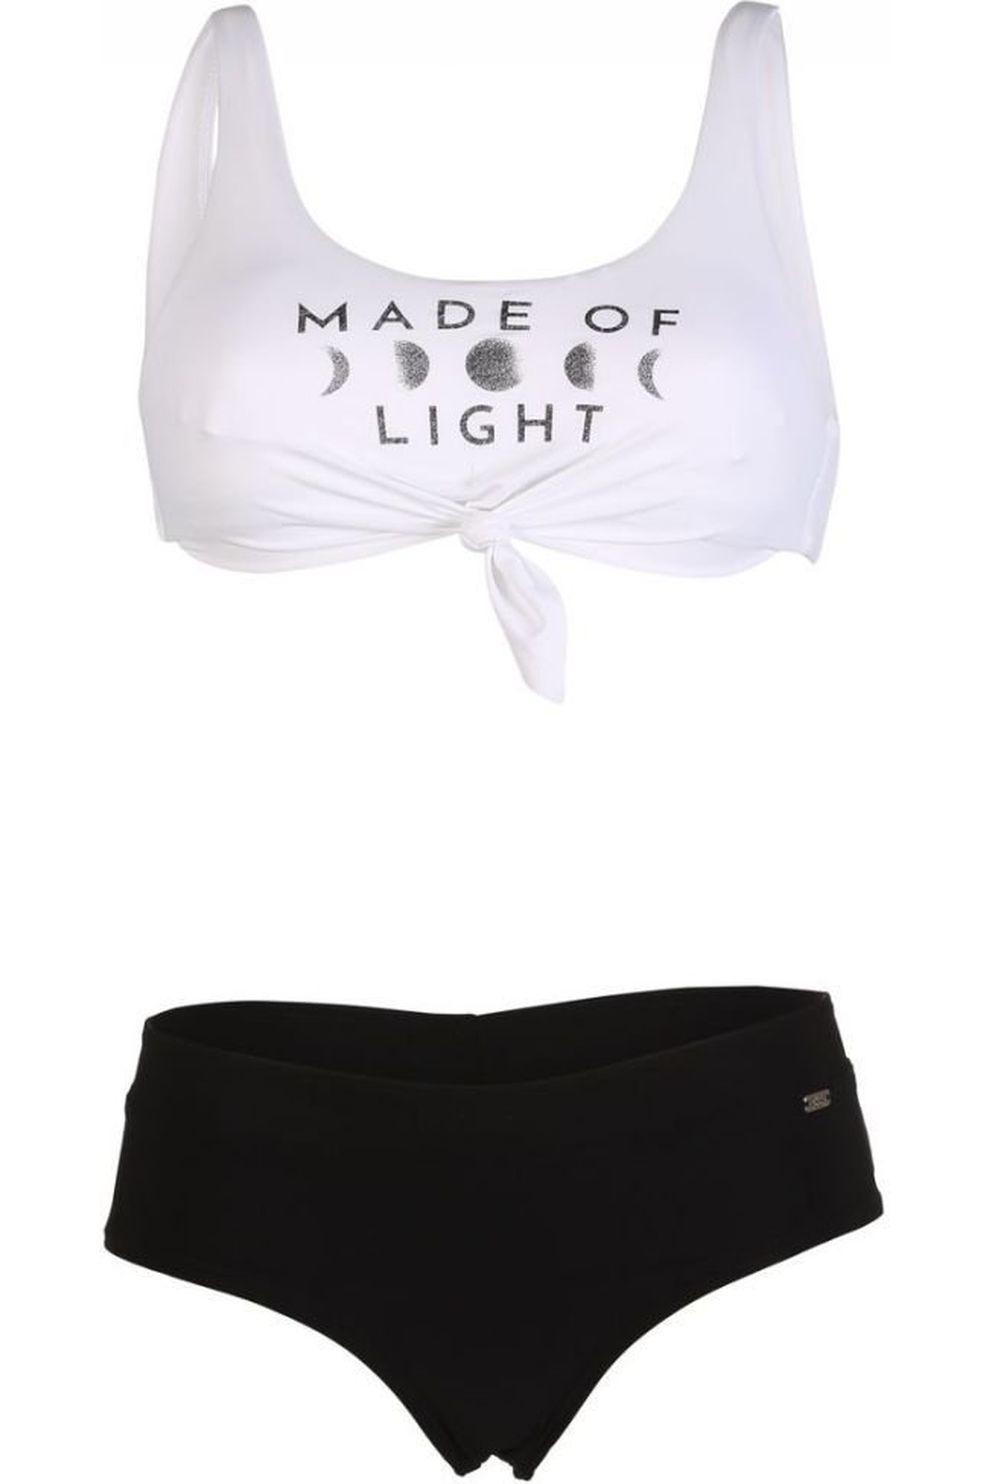 Banana Moon Bikini Nouo Moonlight+Bia Beachbabe voor meisjes - Wit/Zwart - Maten: XXS, L